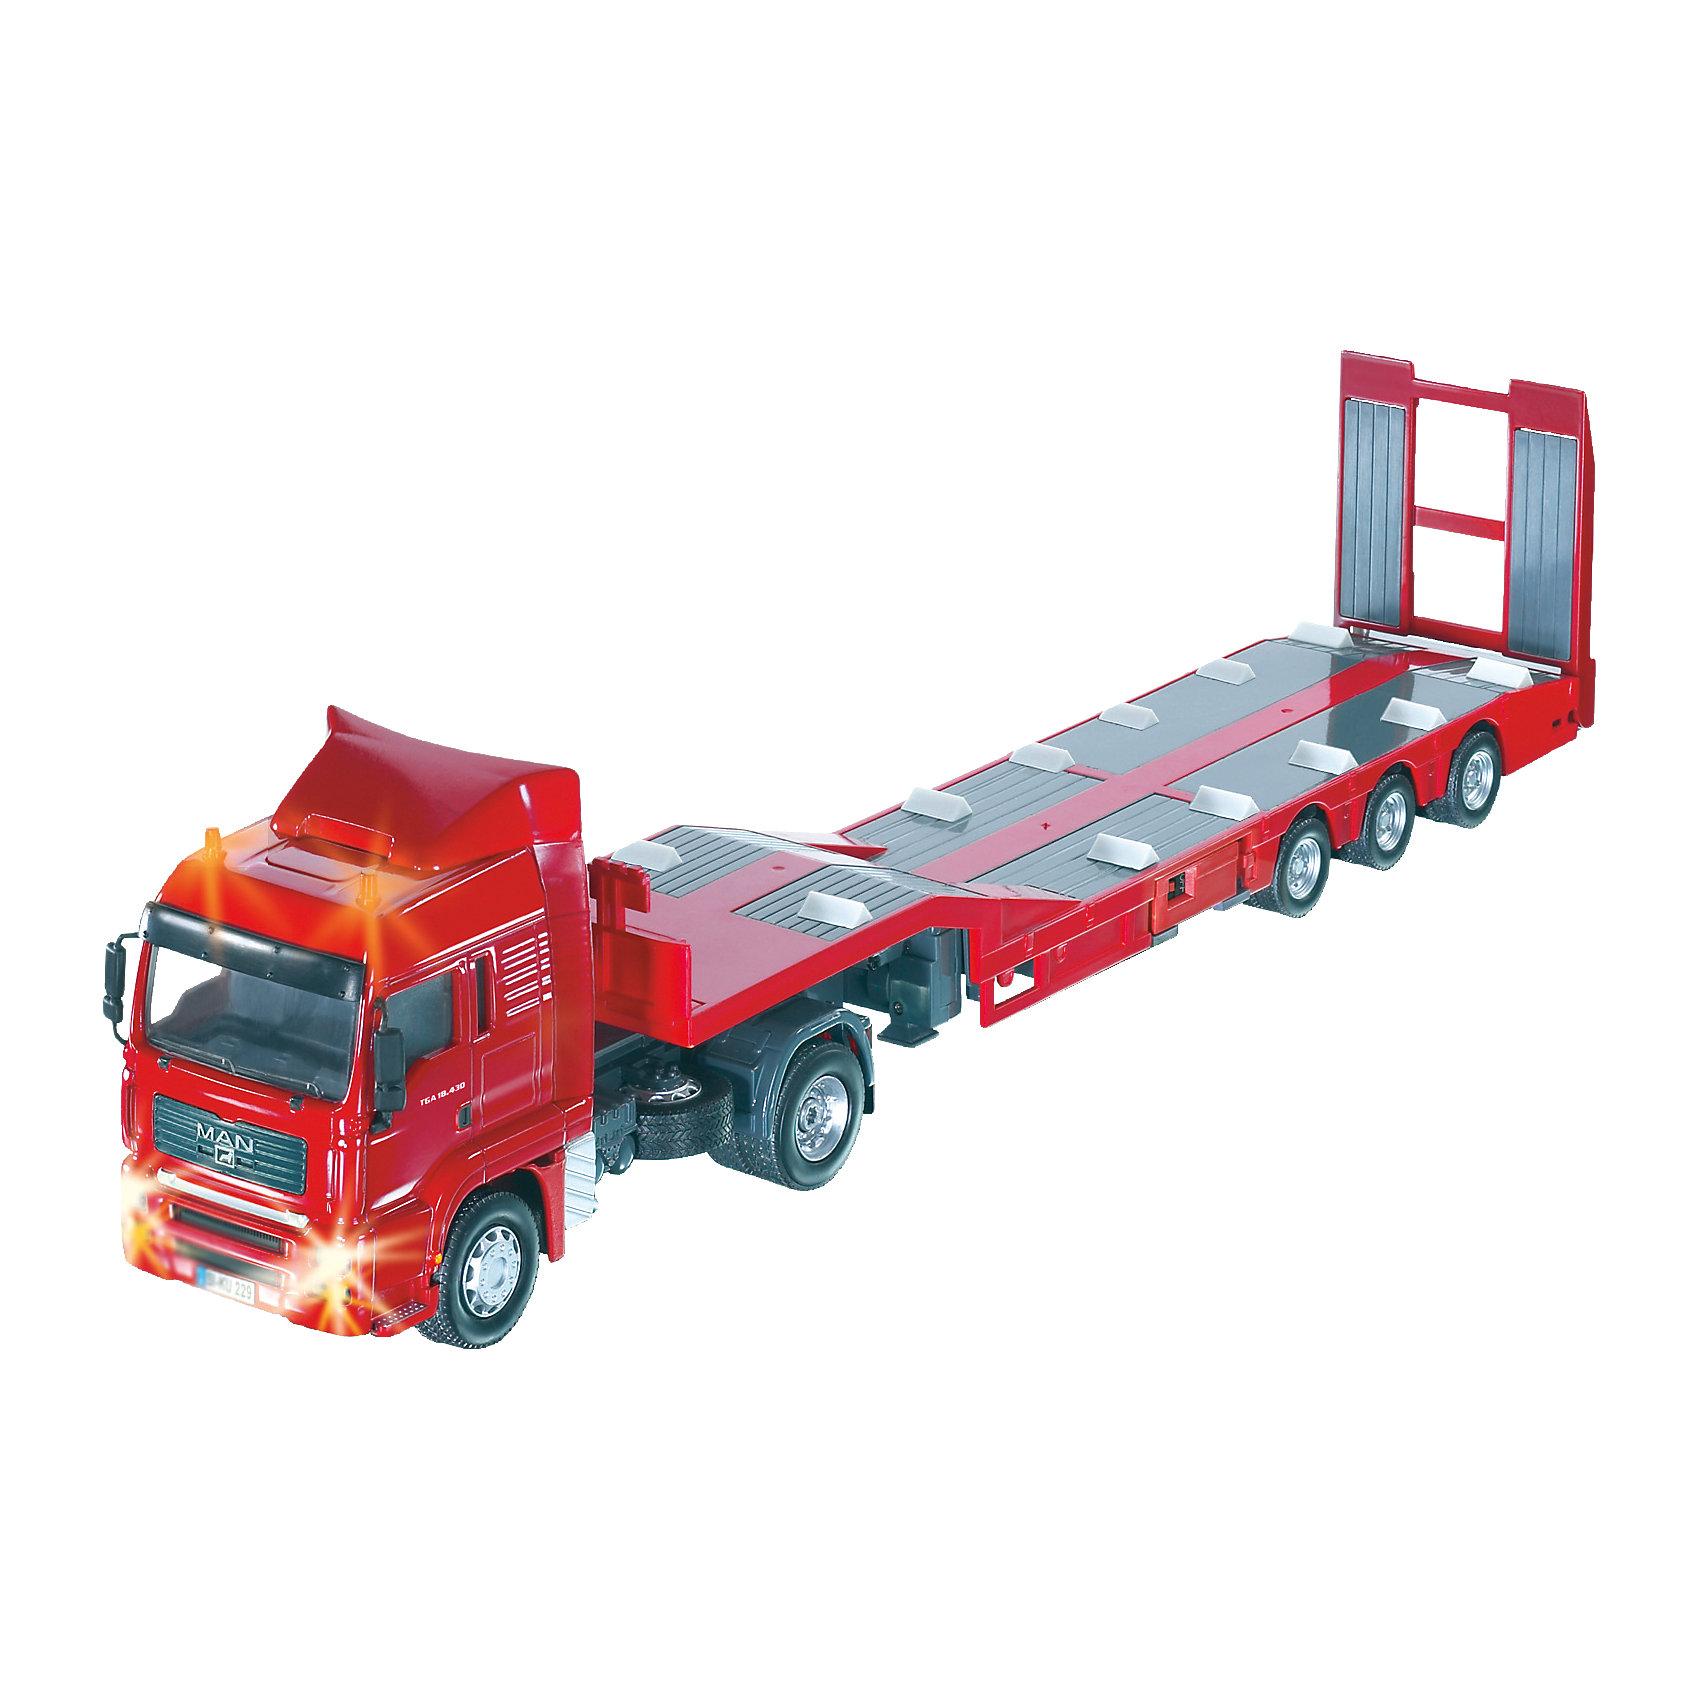 6721 Control 32 RC - Truck MAN